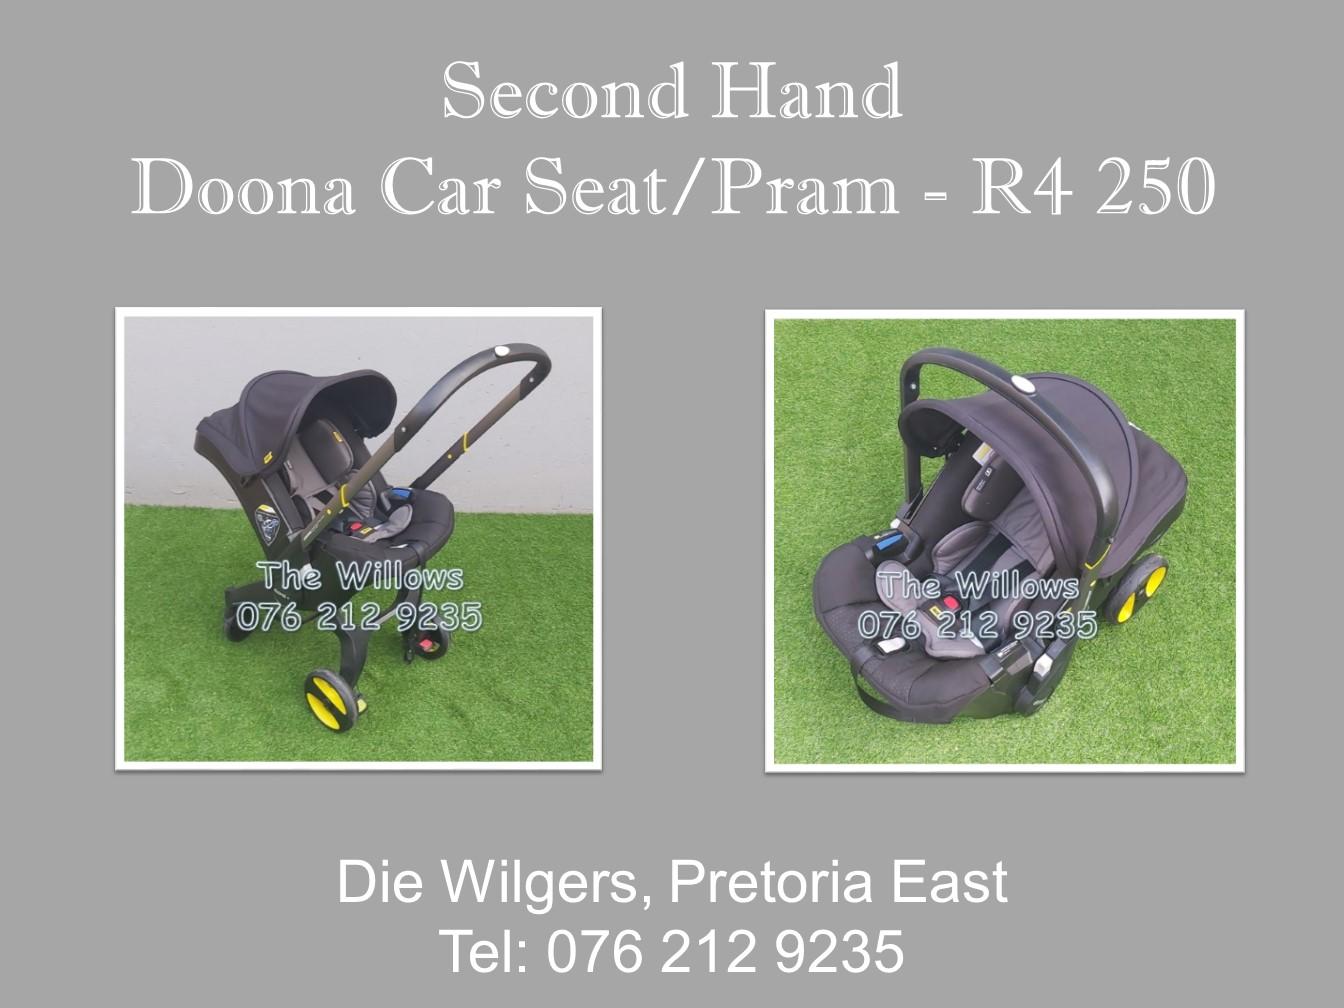 Second Hand Doona Car Seat/Pram